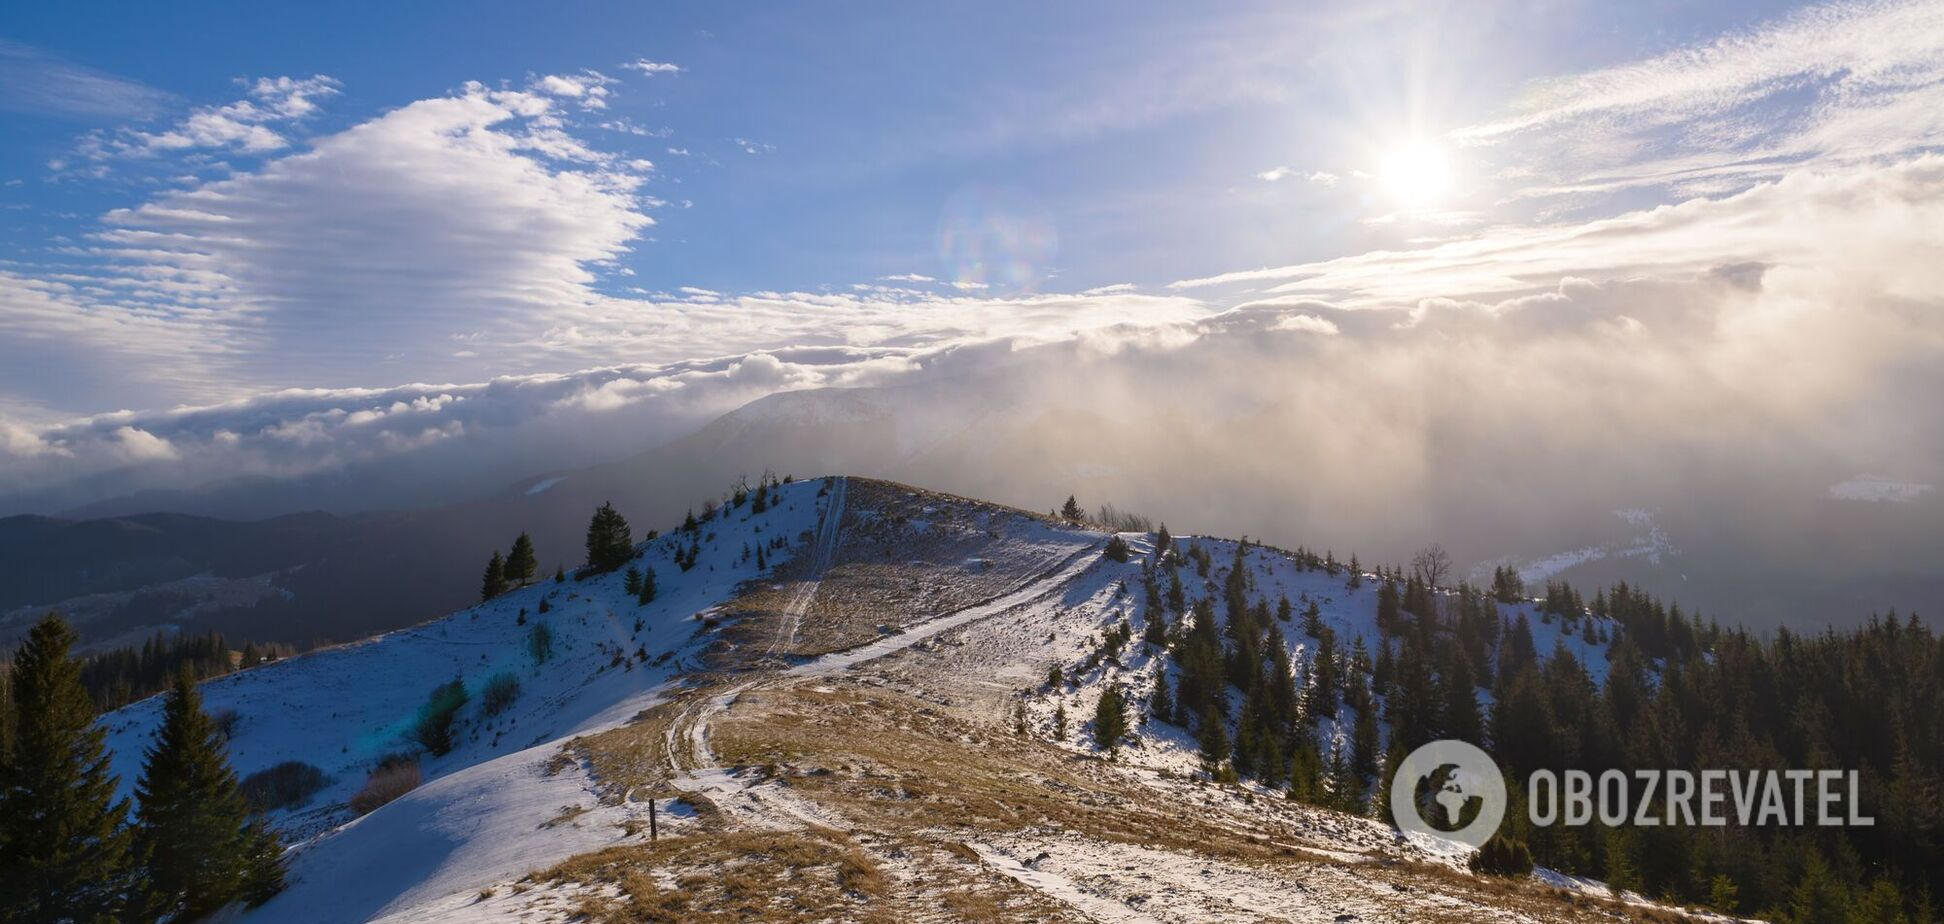 В Карпатах в сентябре выпал снег, ударил мороз до -4. Фото и видео